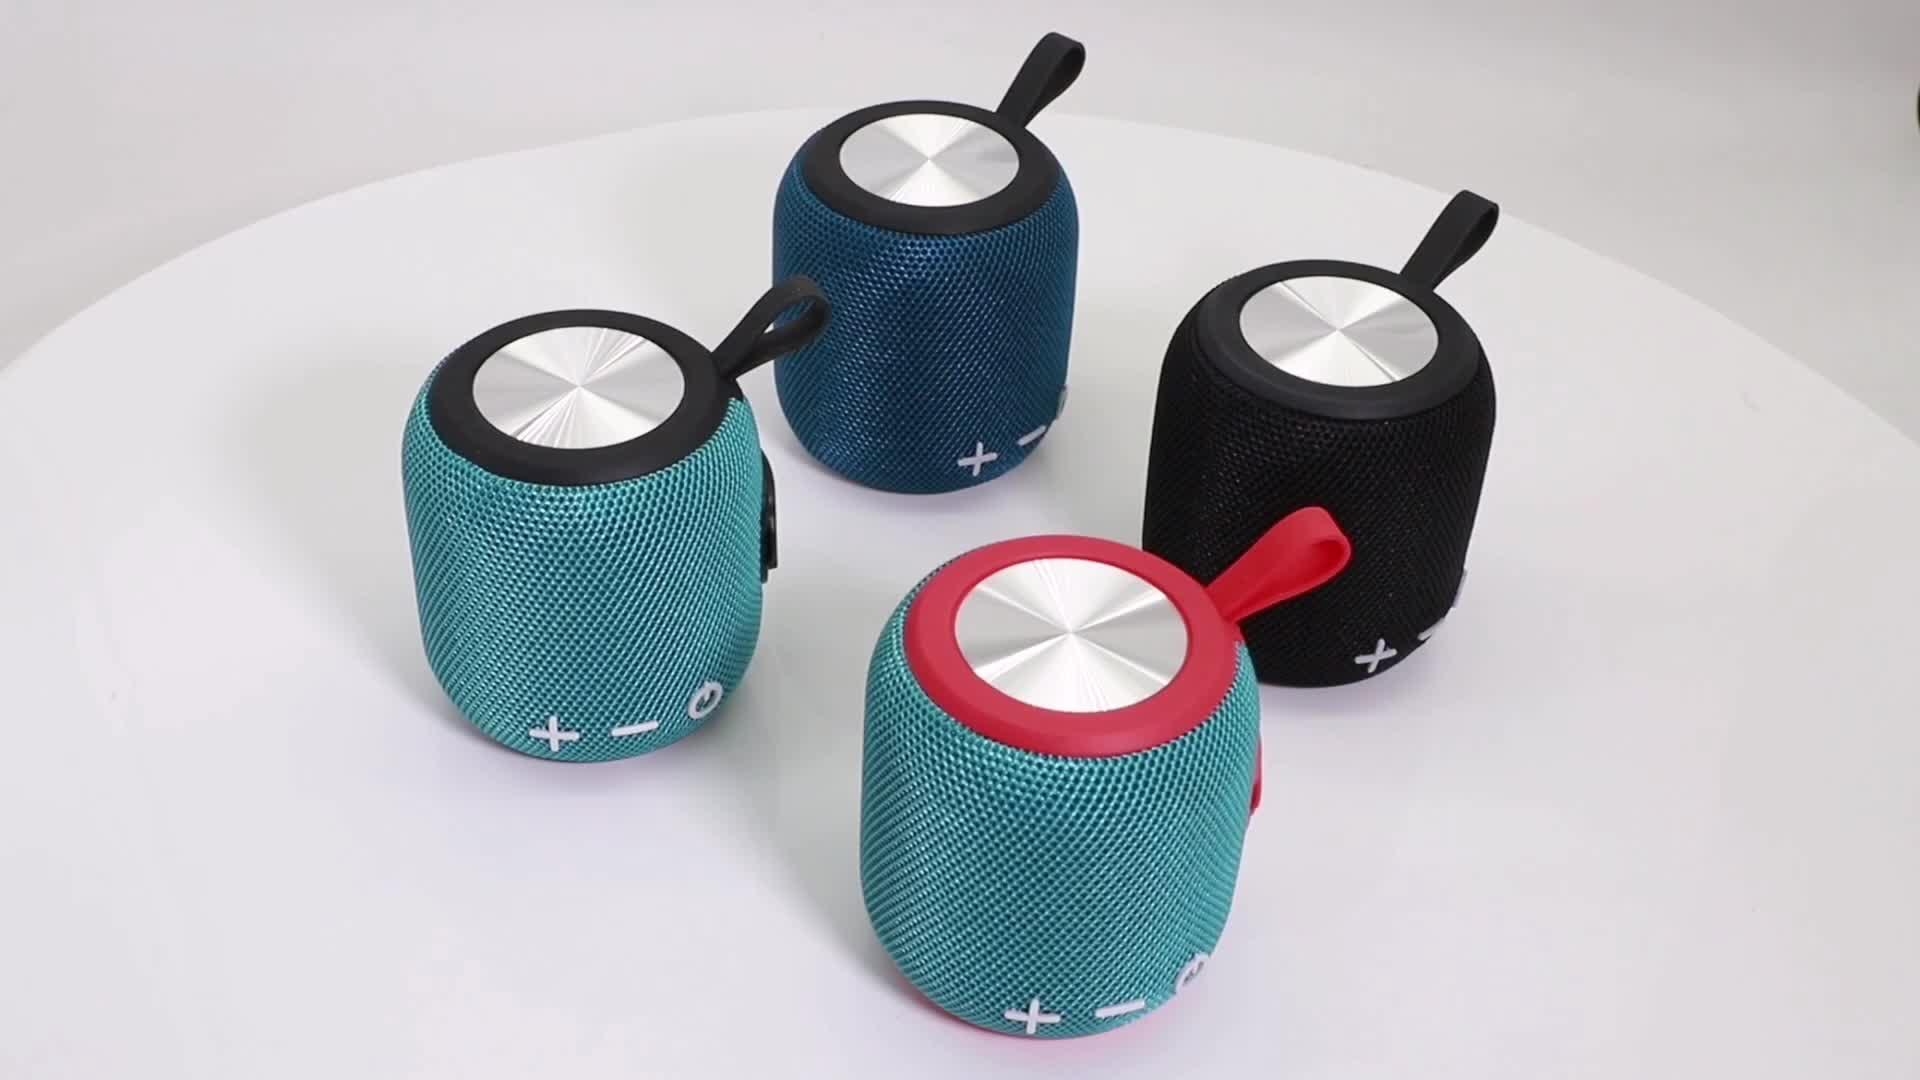 Mp3 Beste Mini Subwoofer Ce Fc Rohs Pro Tech Speakers Auto Dj Waterdichte Ipx7 Bass Bluetooth Speaker Voor Home